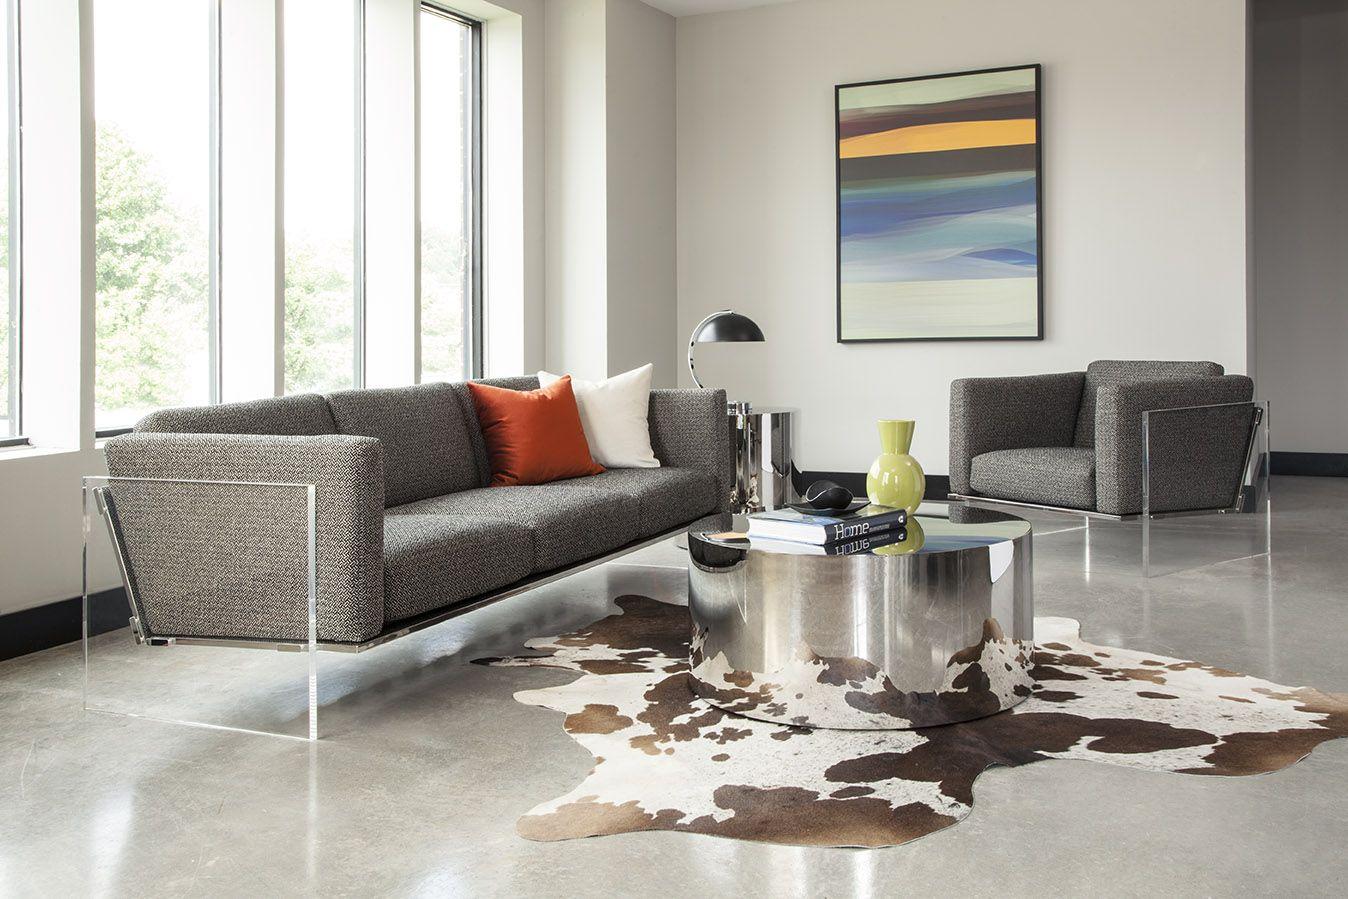 Modern Furniture Styles MonclerFactoryOutletscom - Modern sofa styles